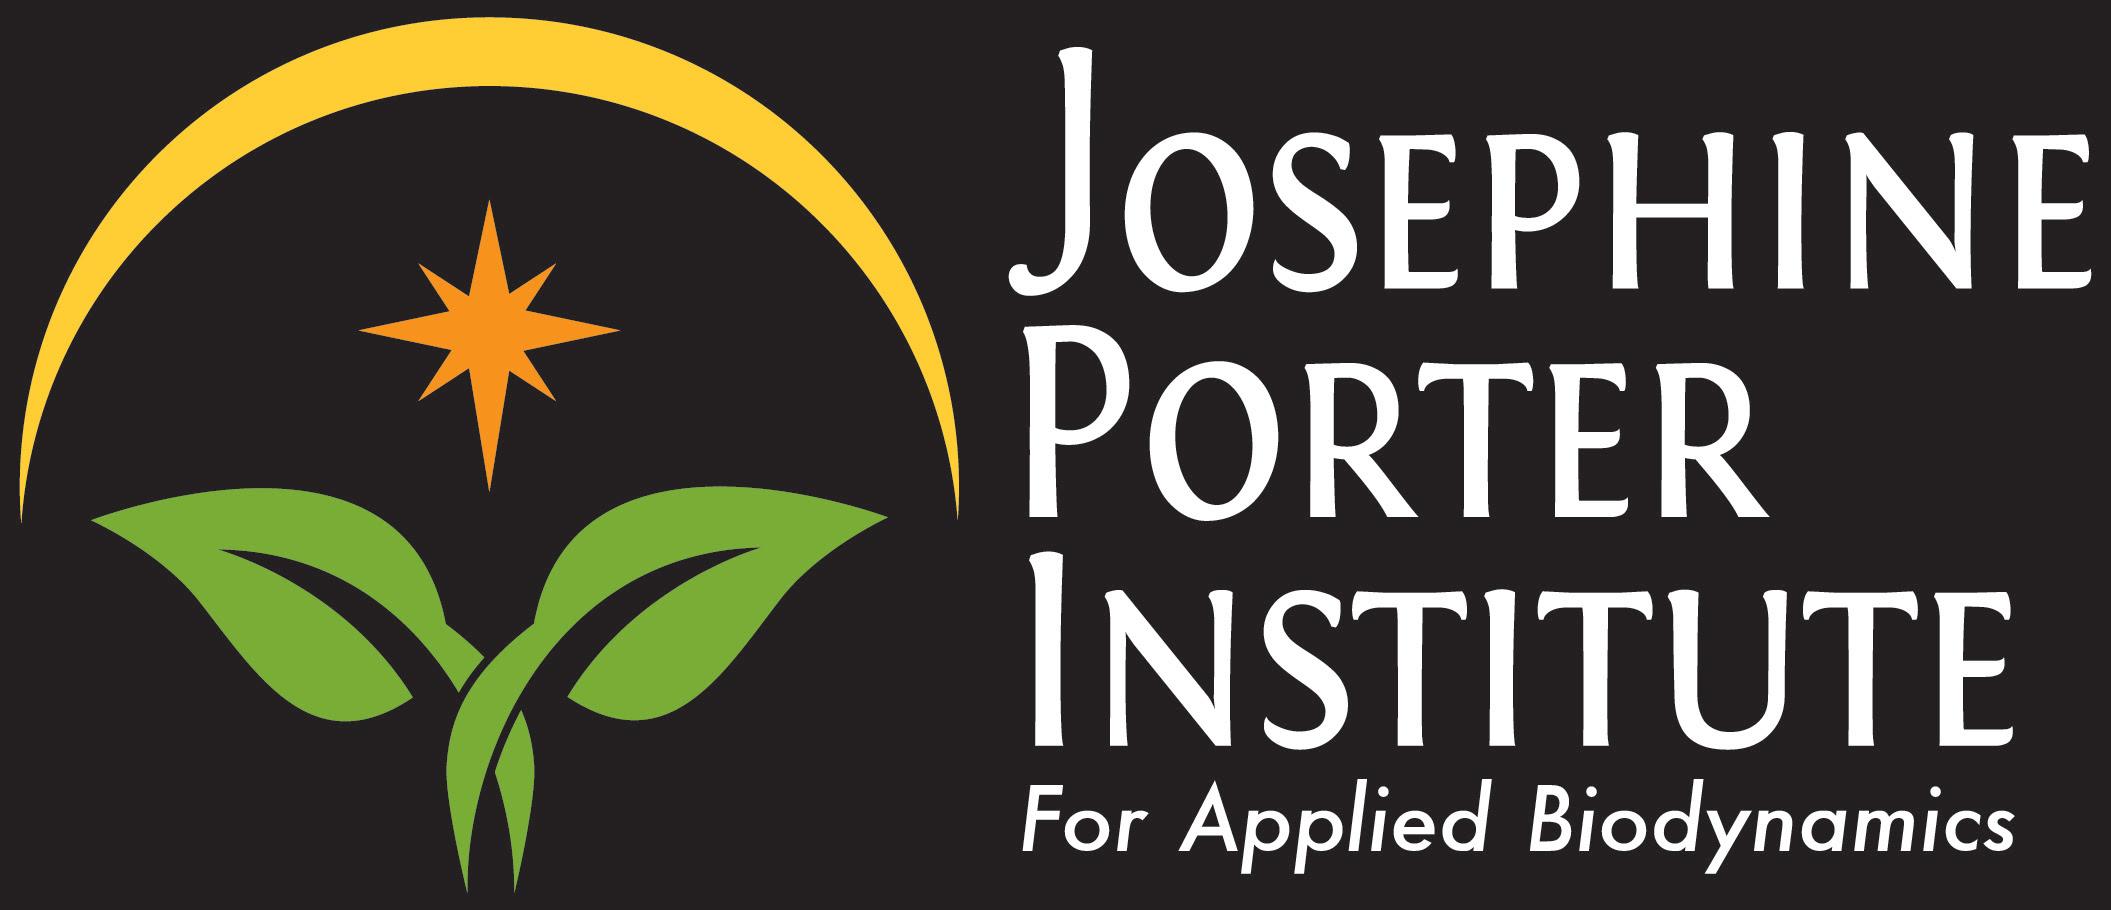 Josephine Porter Institute for Applied Biodynamics